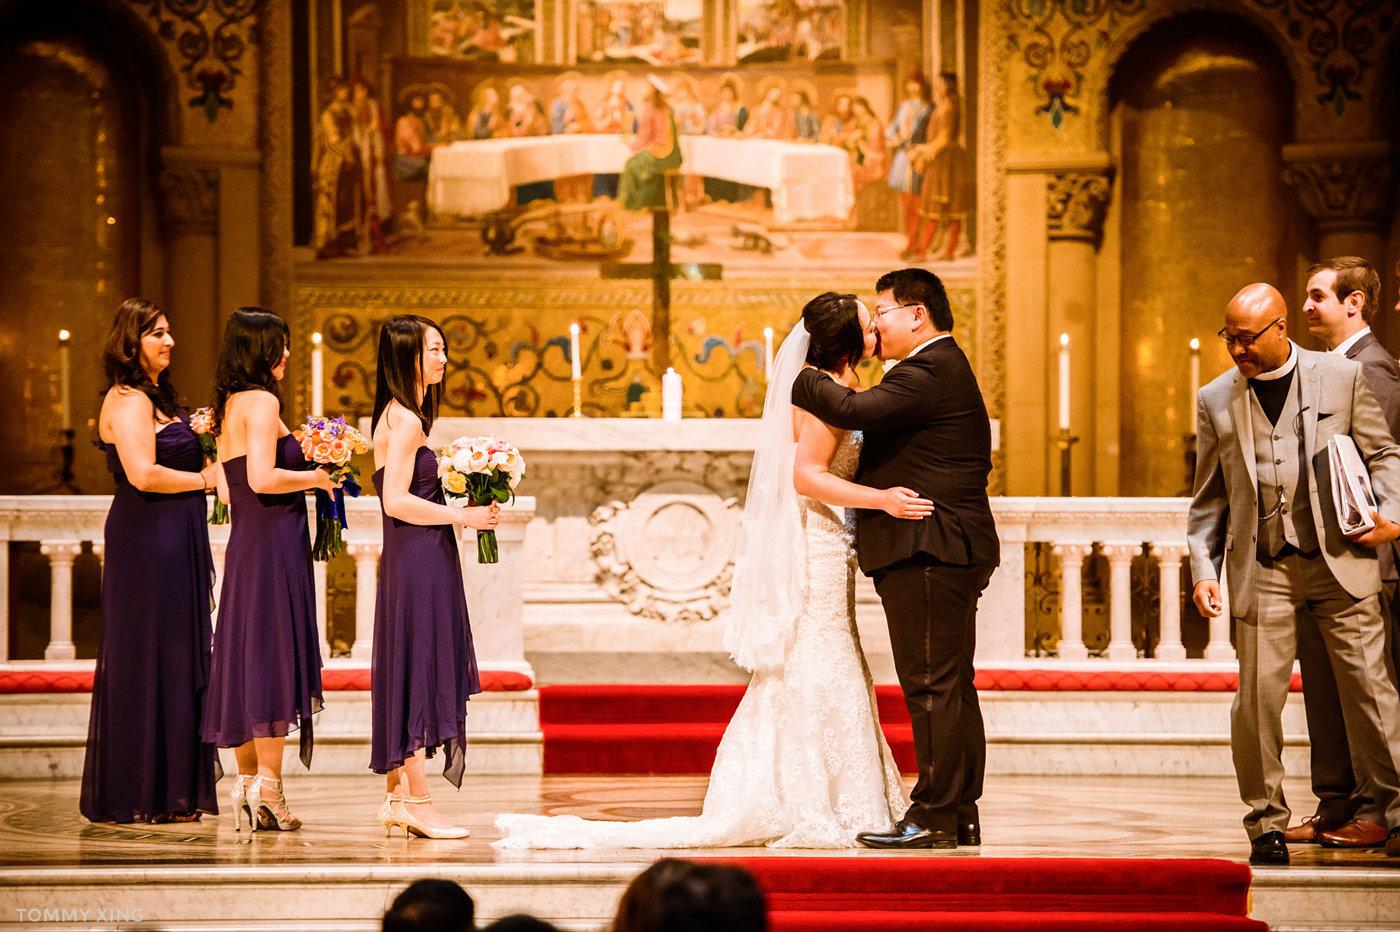 STANFORD MEMORIAL CHURCH WEDDING - Wenjie & Chengcheng - SAN FRANCISCO BAY AREA 斯坦福教堂婚礼跟拍 - 洛杉矶婚礼婚纱照摄影师 Tommy Xing Photography110.jpg